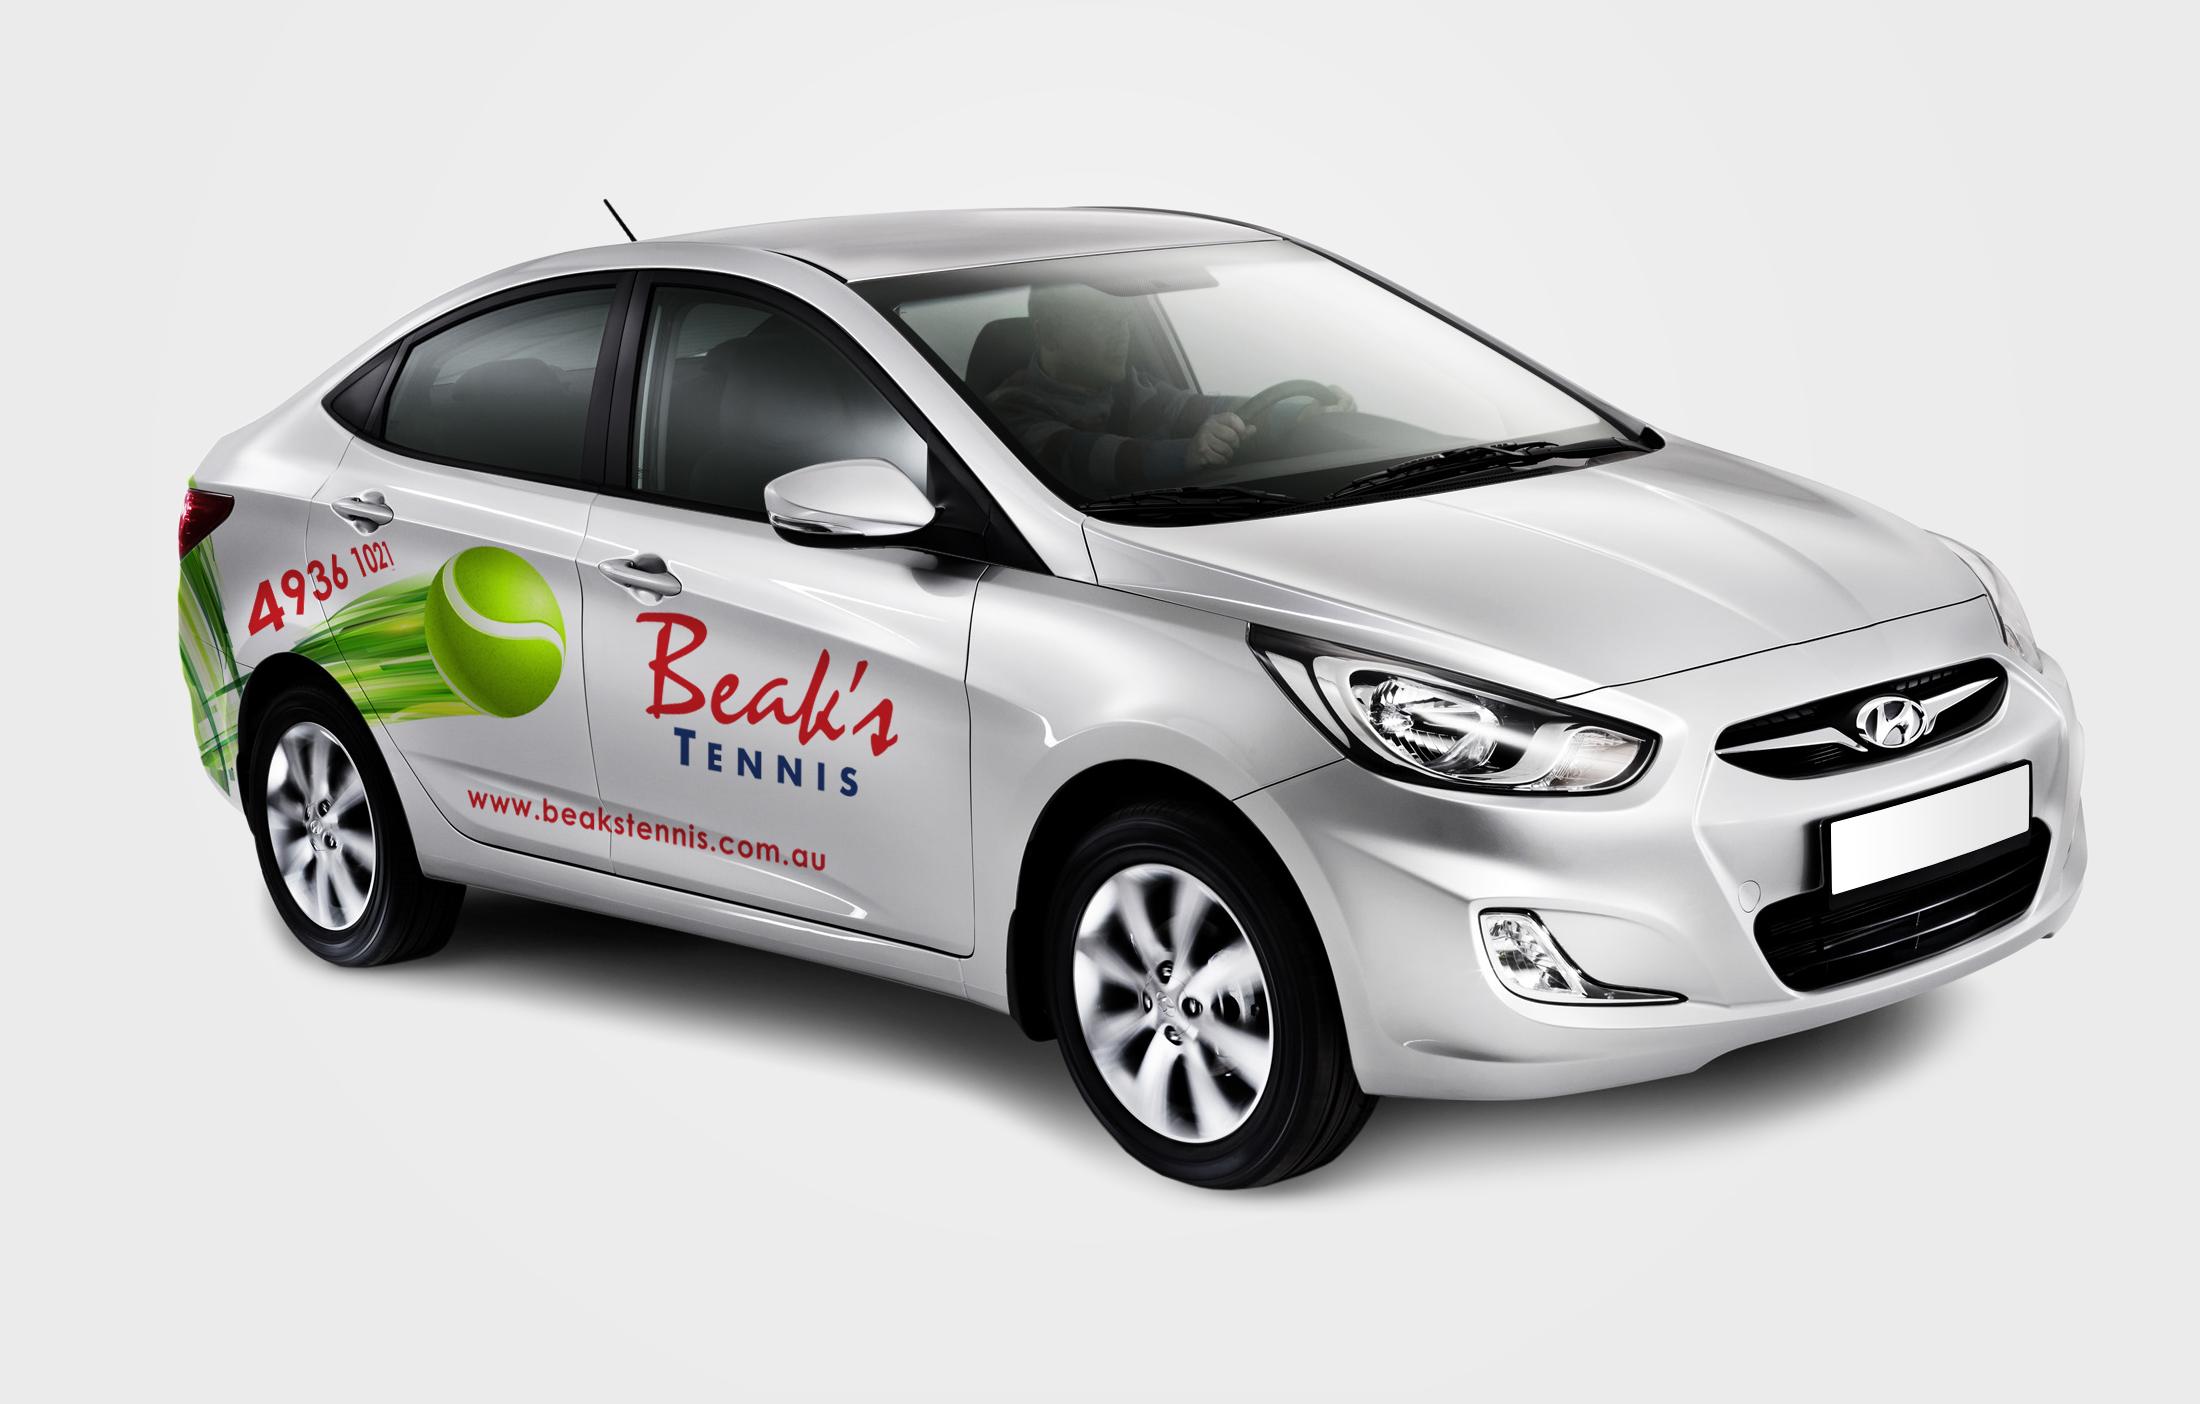 APAP Events Event Management and Graphic Design Rockhampton Beaks Tennis Car Graphics